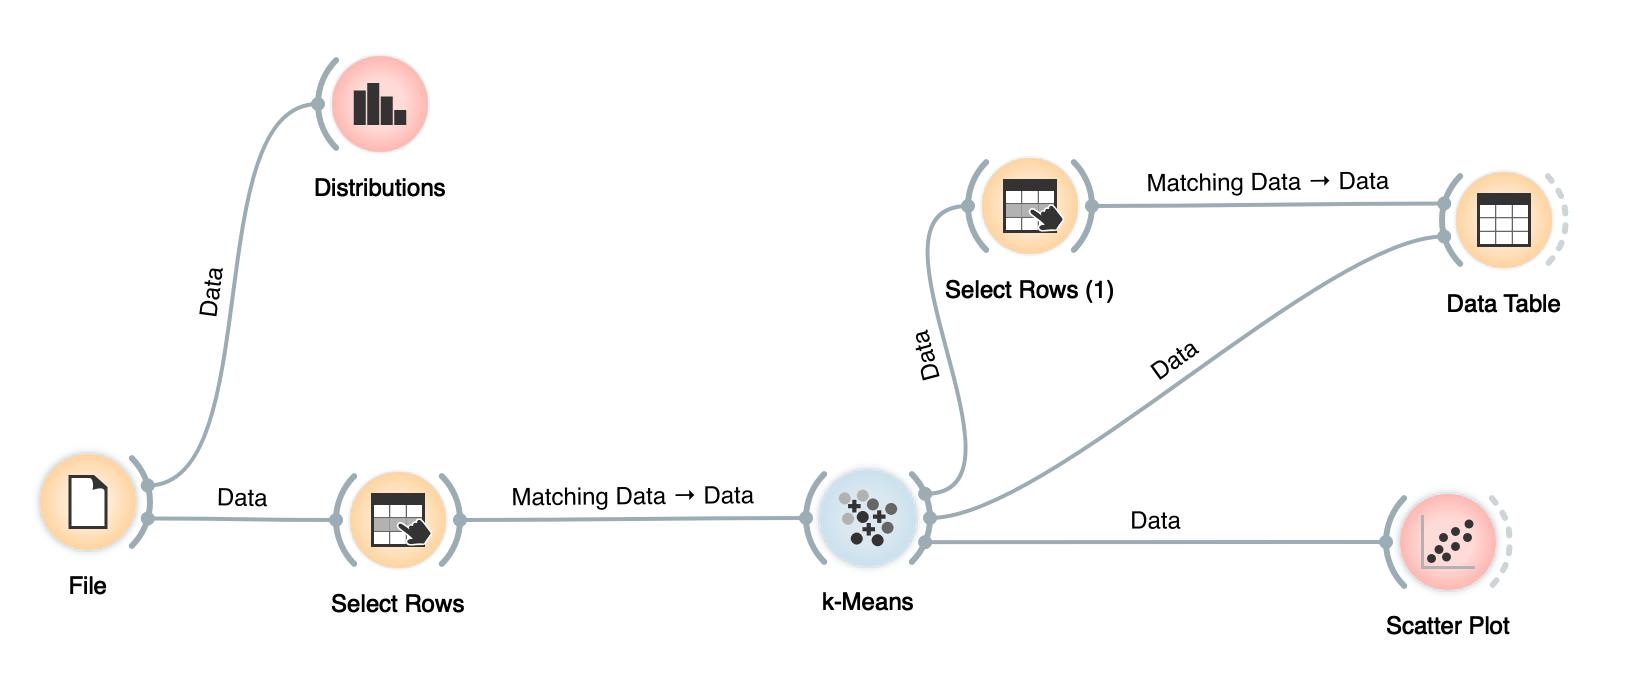 The data analysis pipeline in Orange